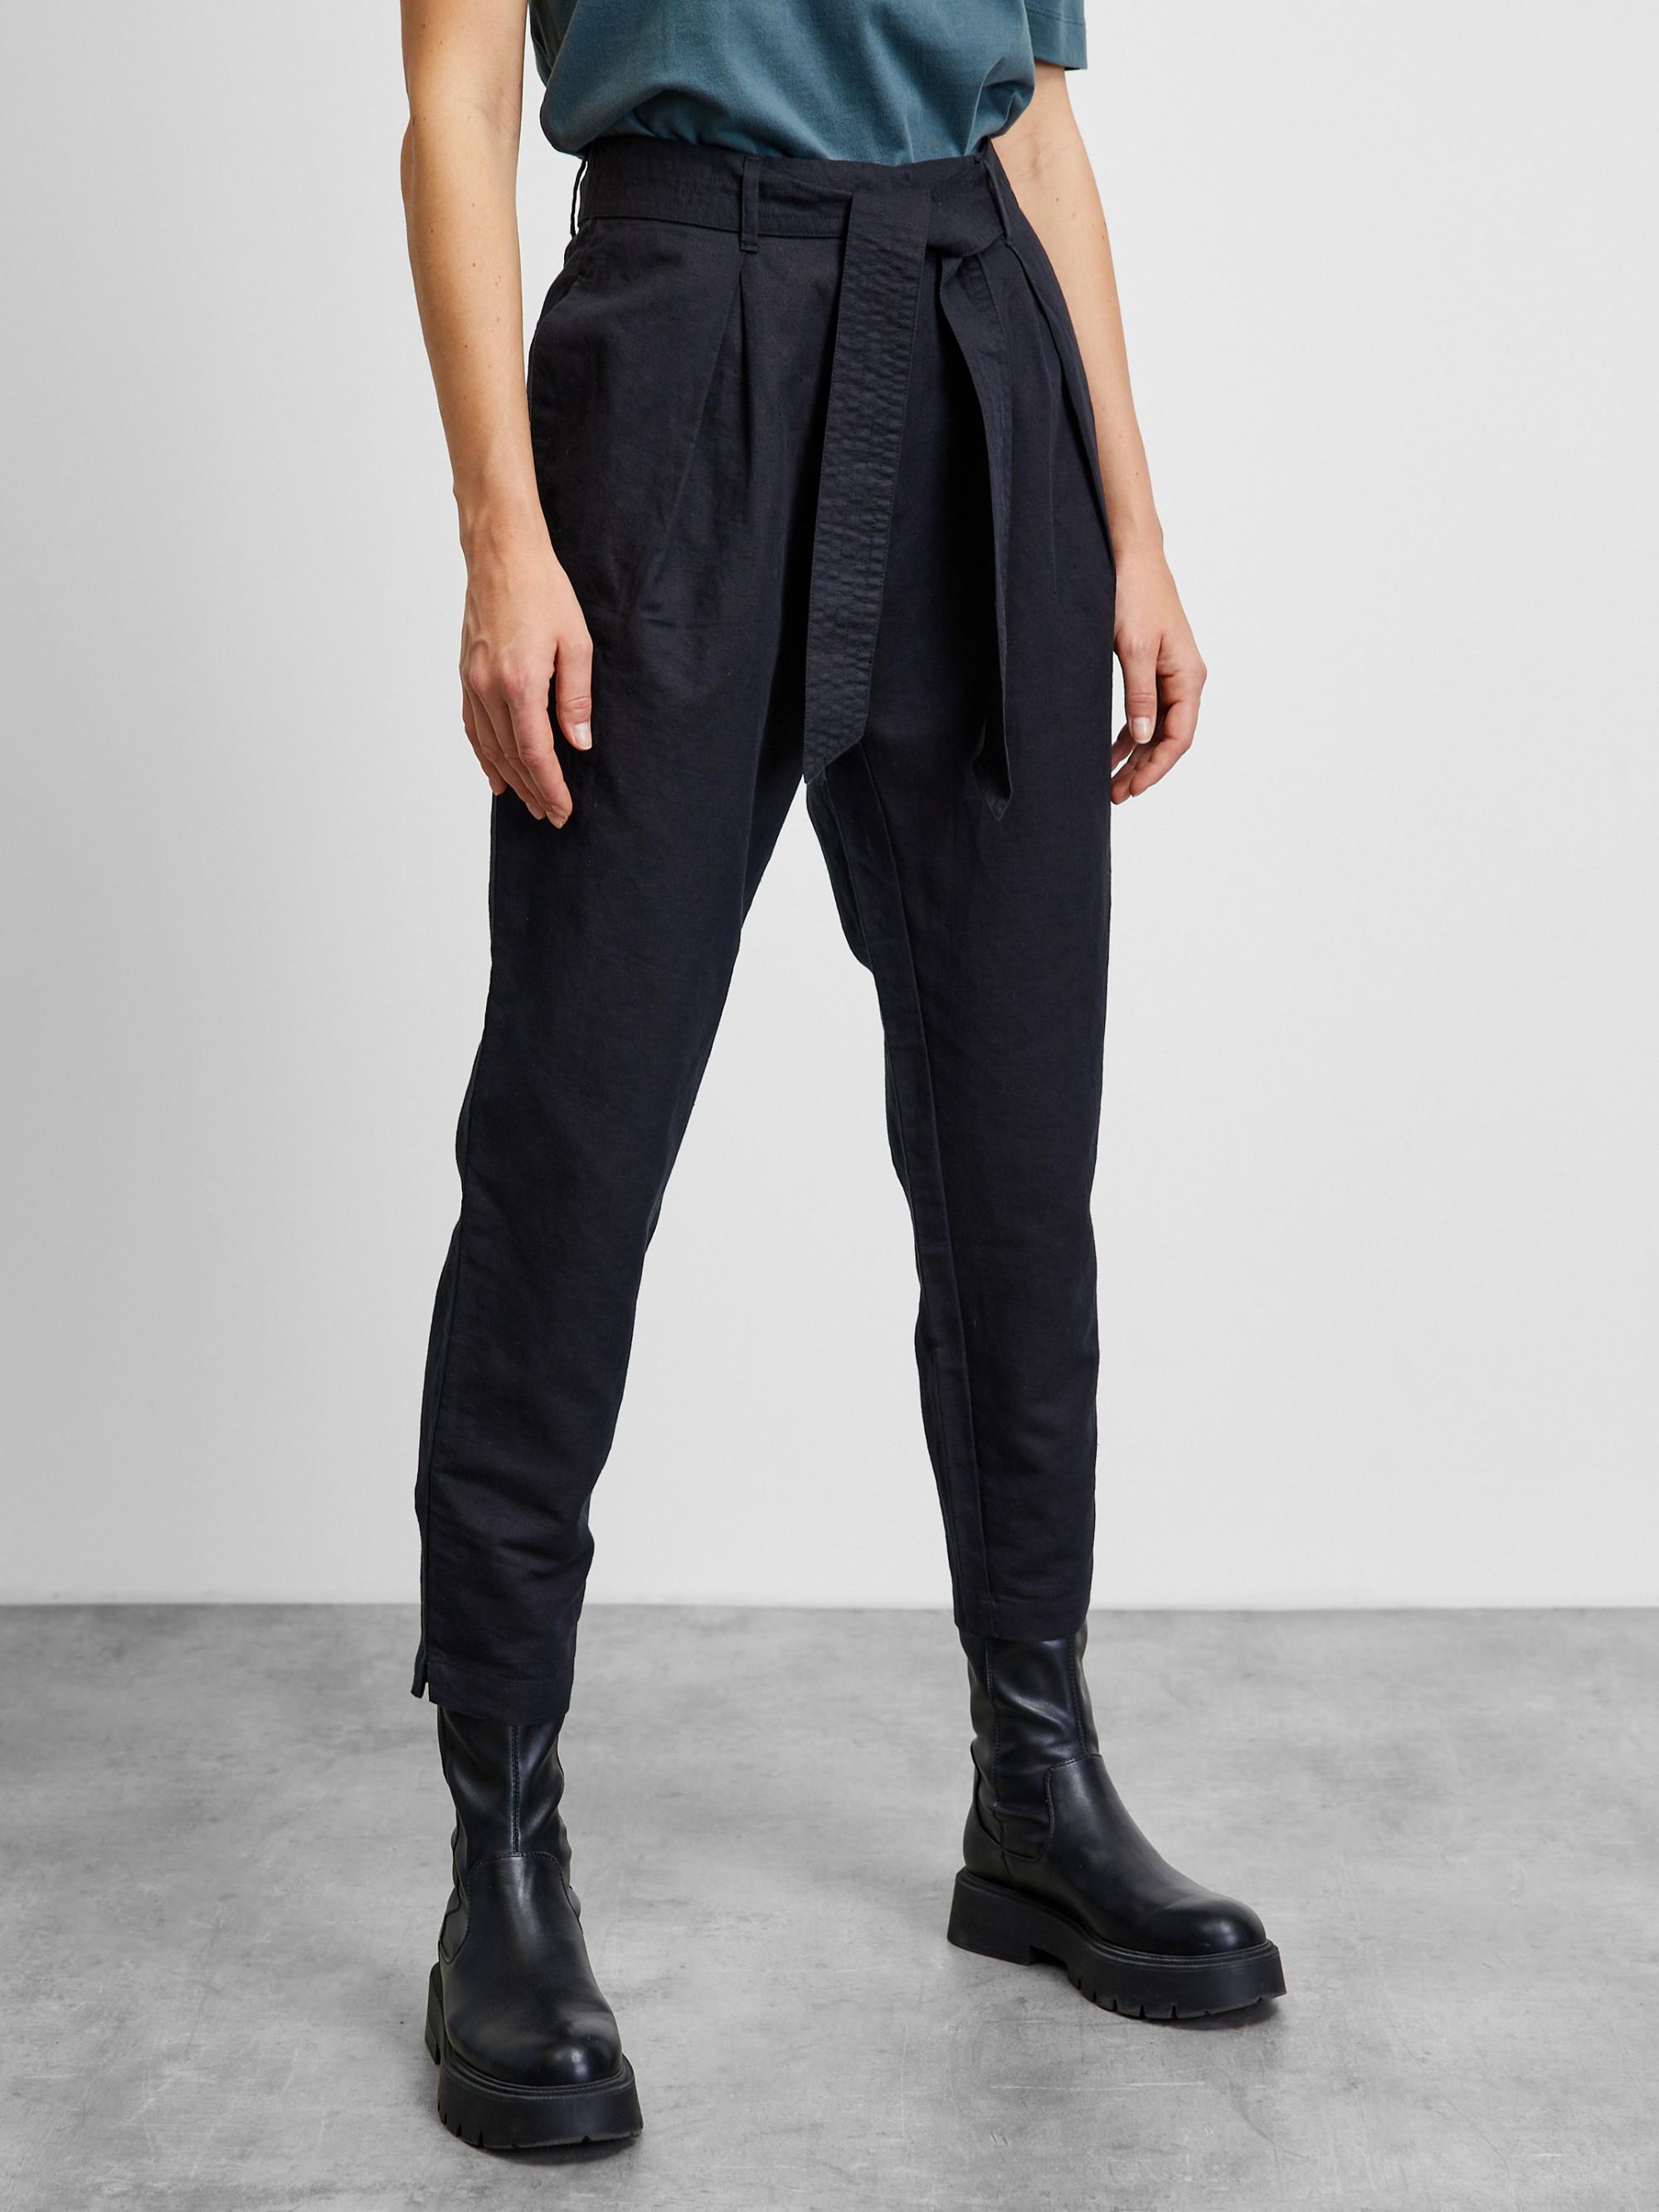 ZOOT čierne nohavice Alondra - XL